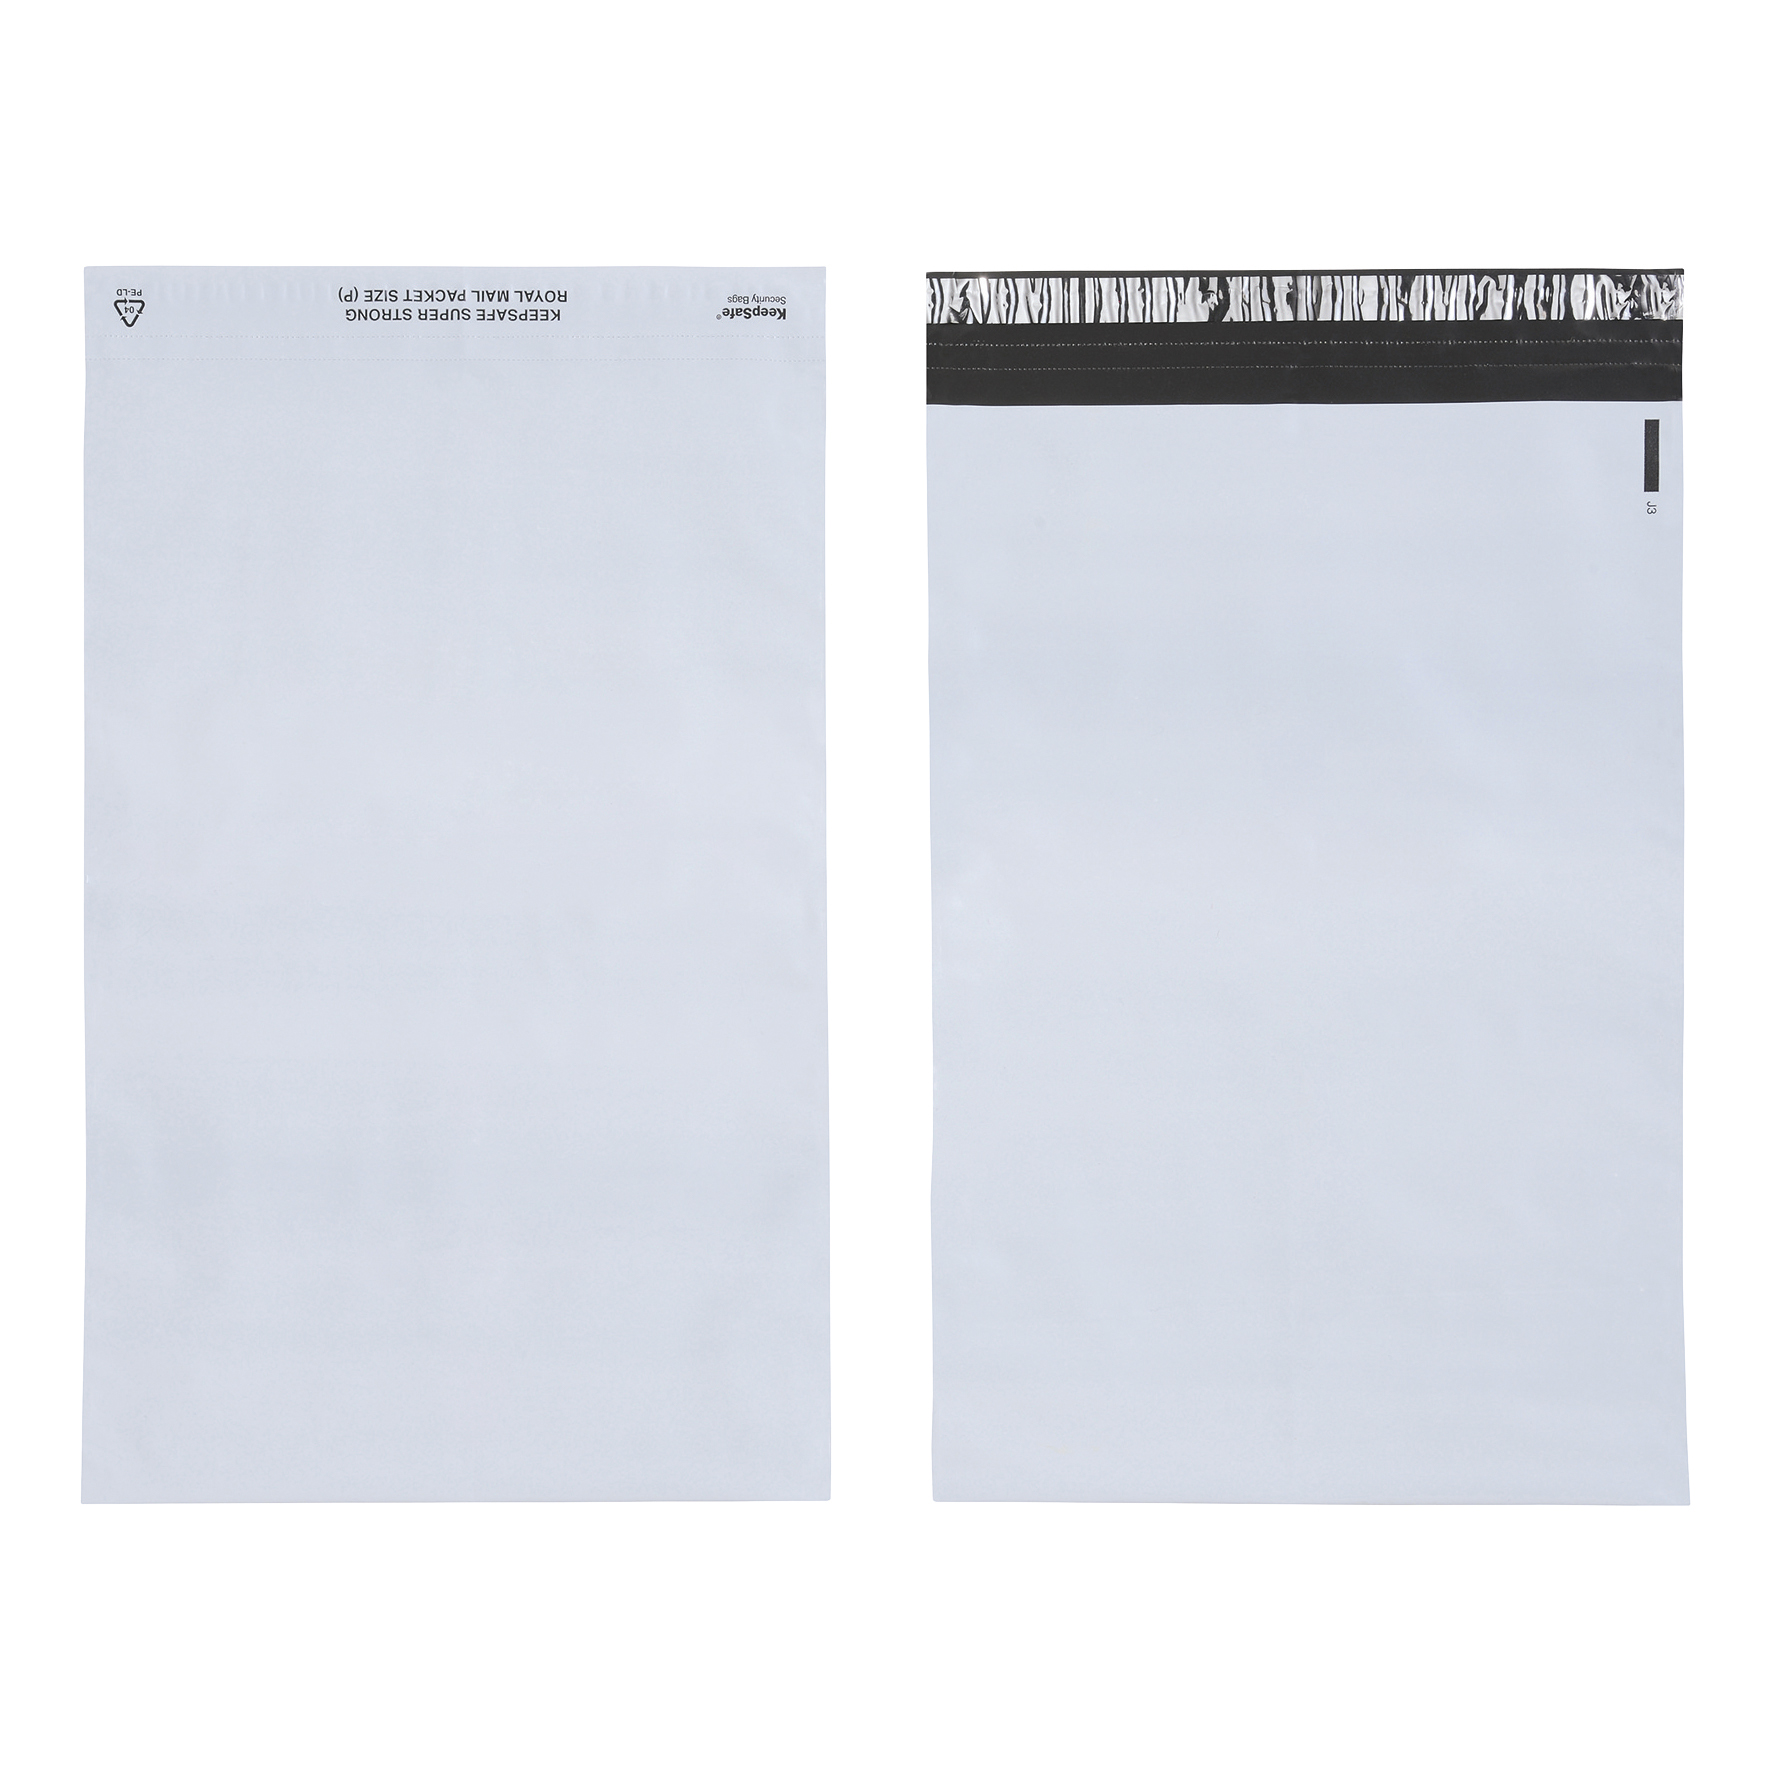 Keepsafe SuperStrong Envelope Polythene Opaque D4 W260xH380mm Peel & Seal Ref KSV-SS4 Pack 100